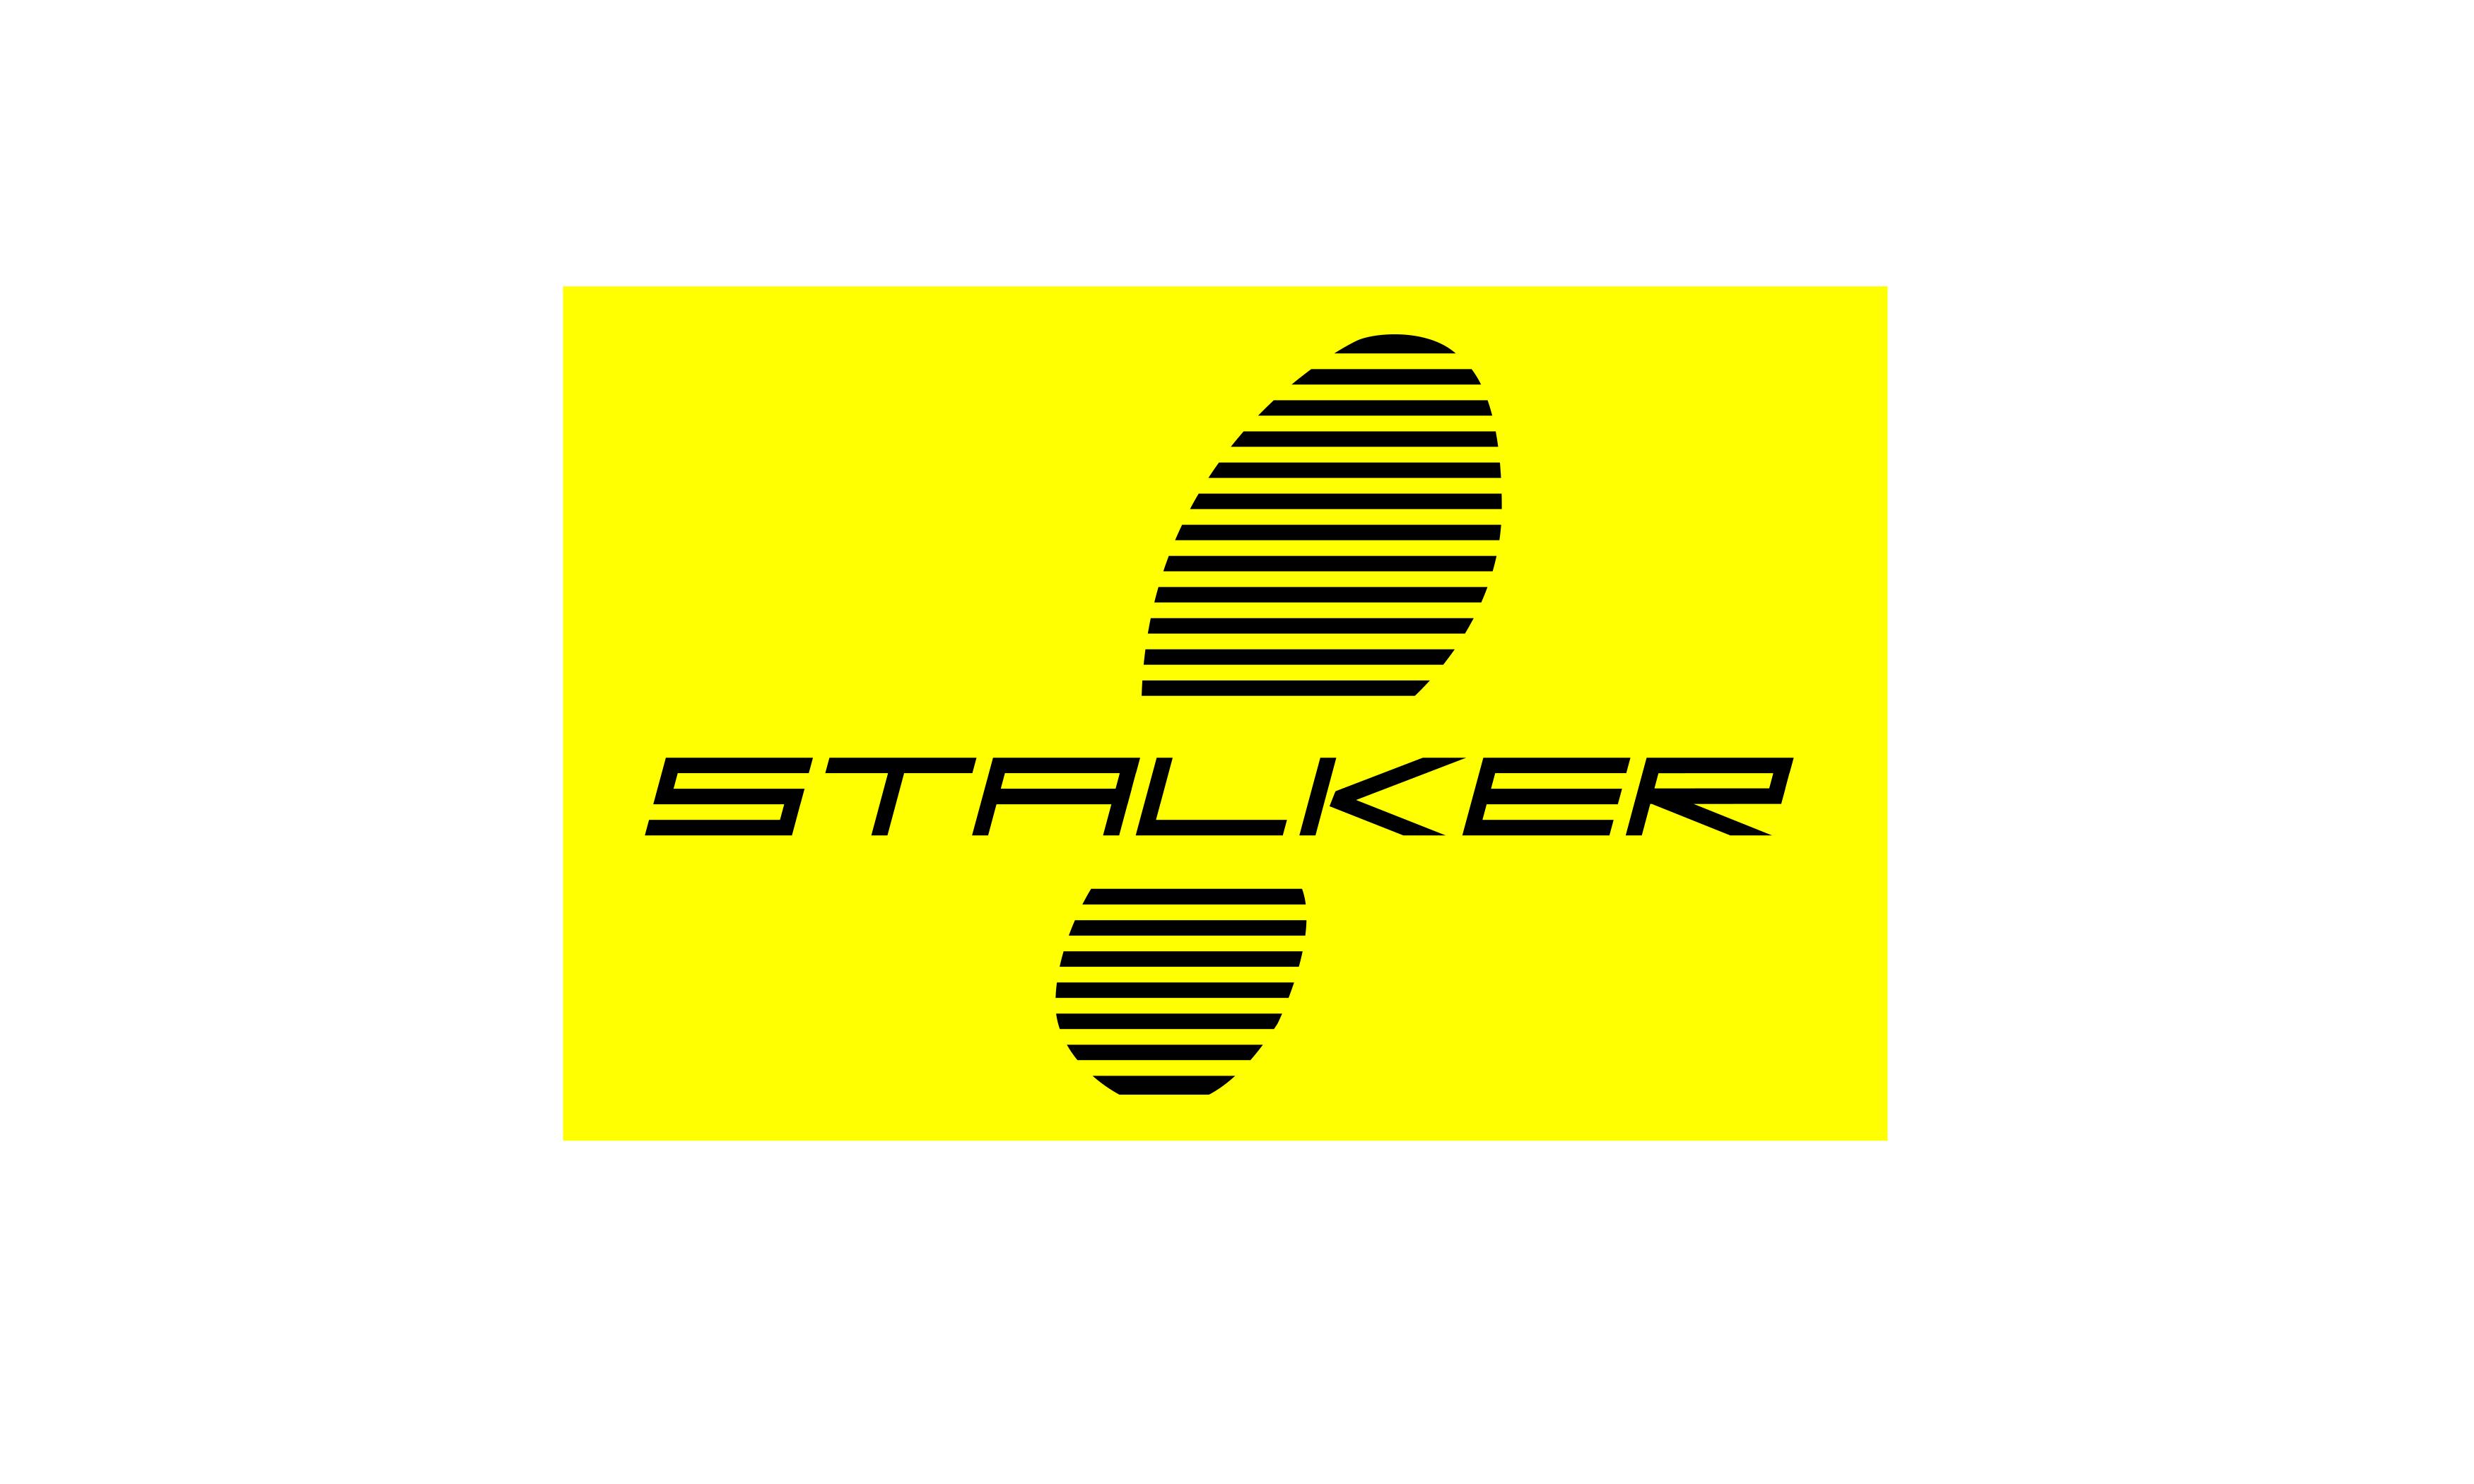 Разработать логотип для вездехода фото f_8645f8f38349ad64.jpg